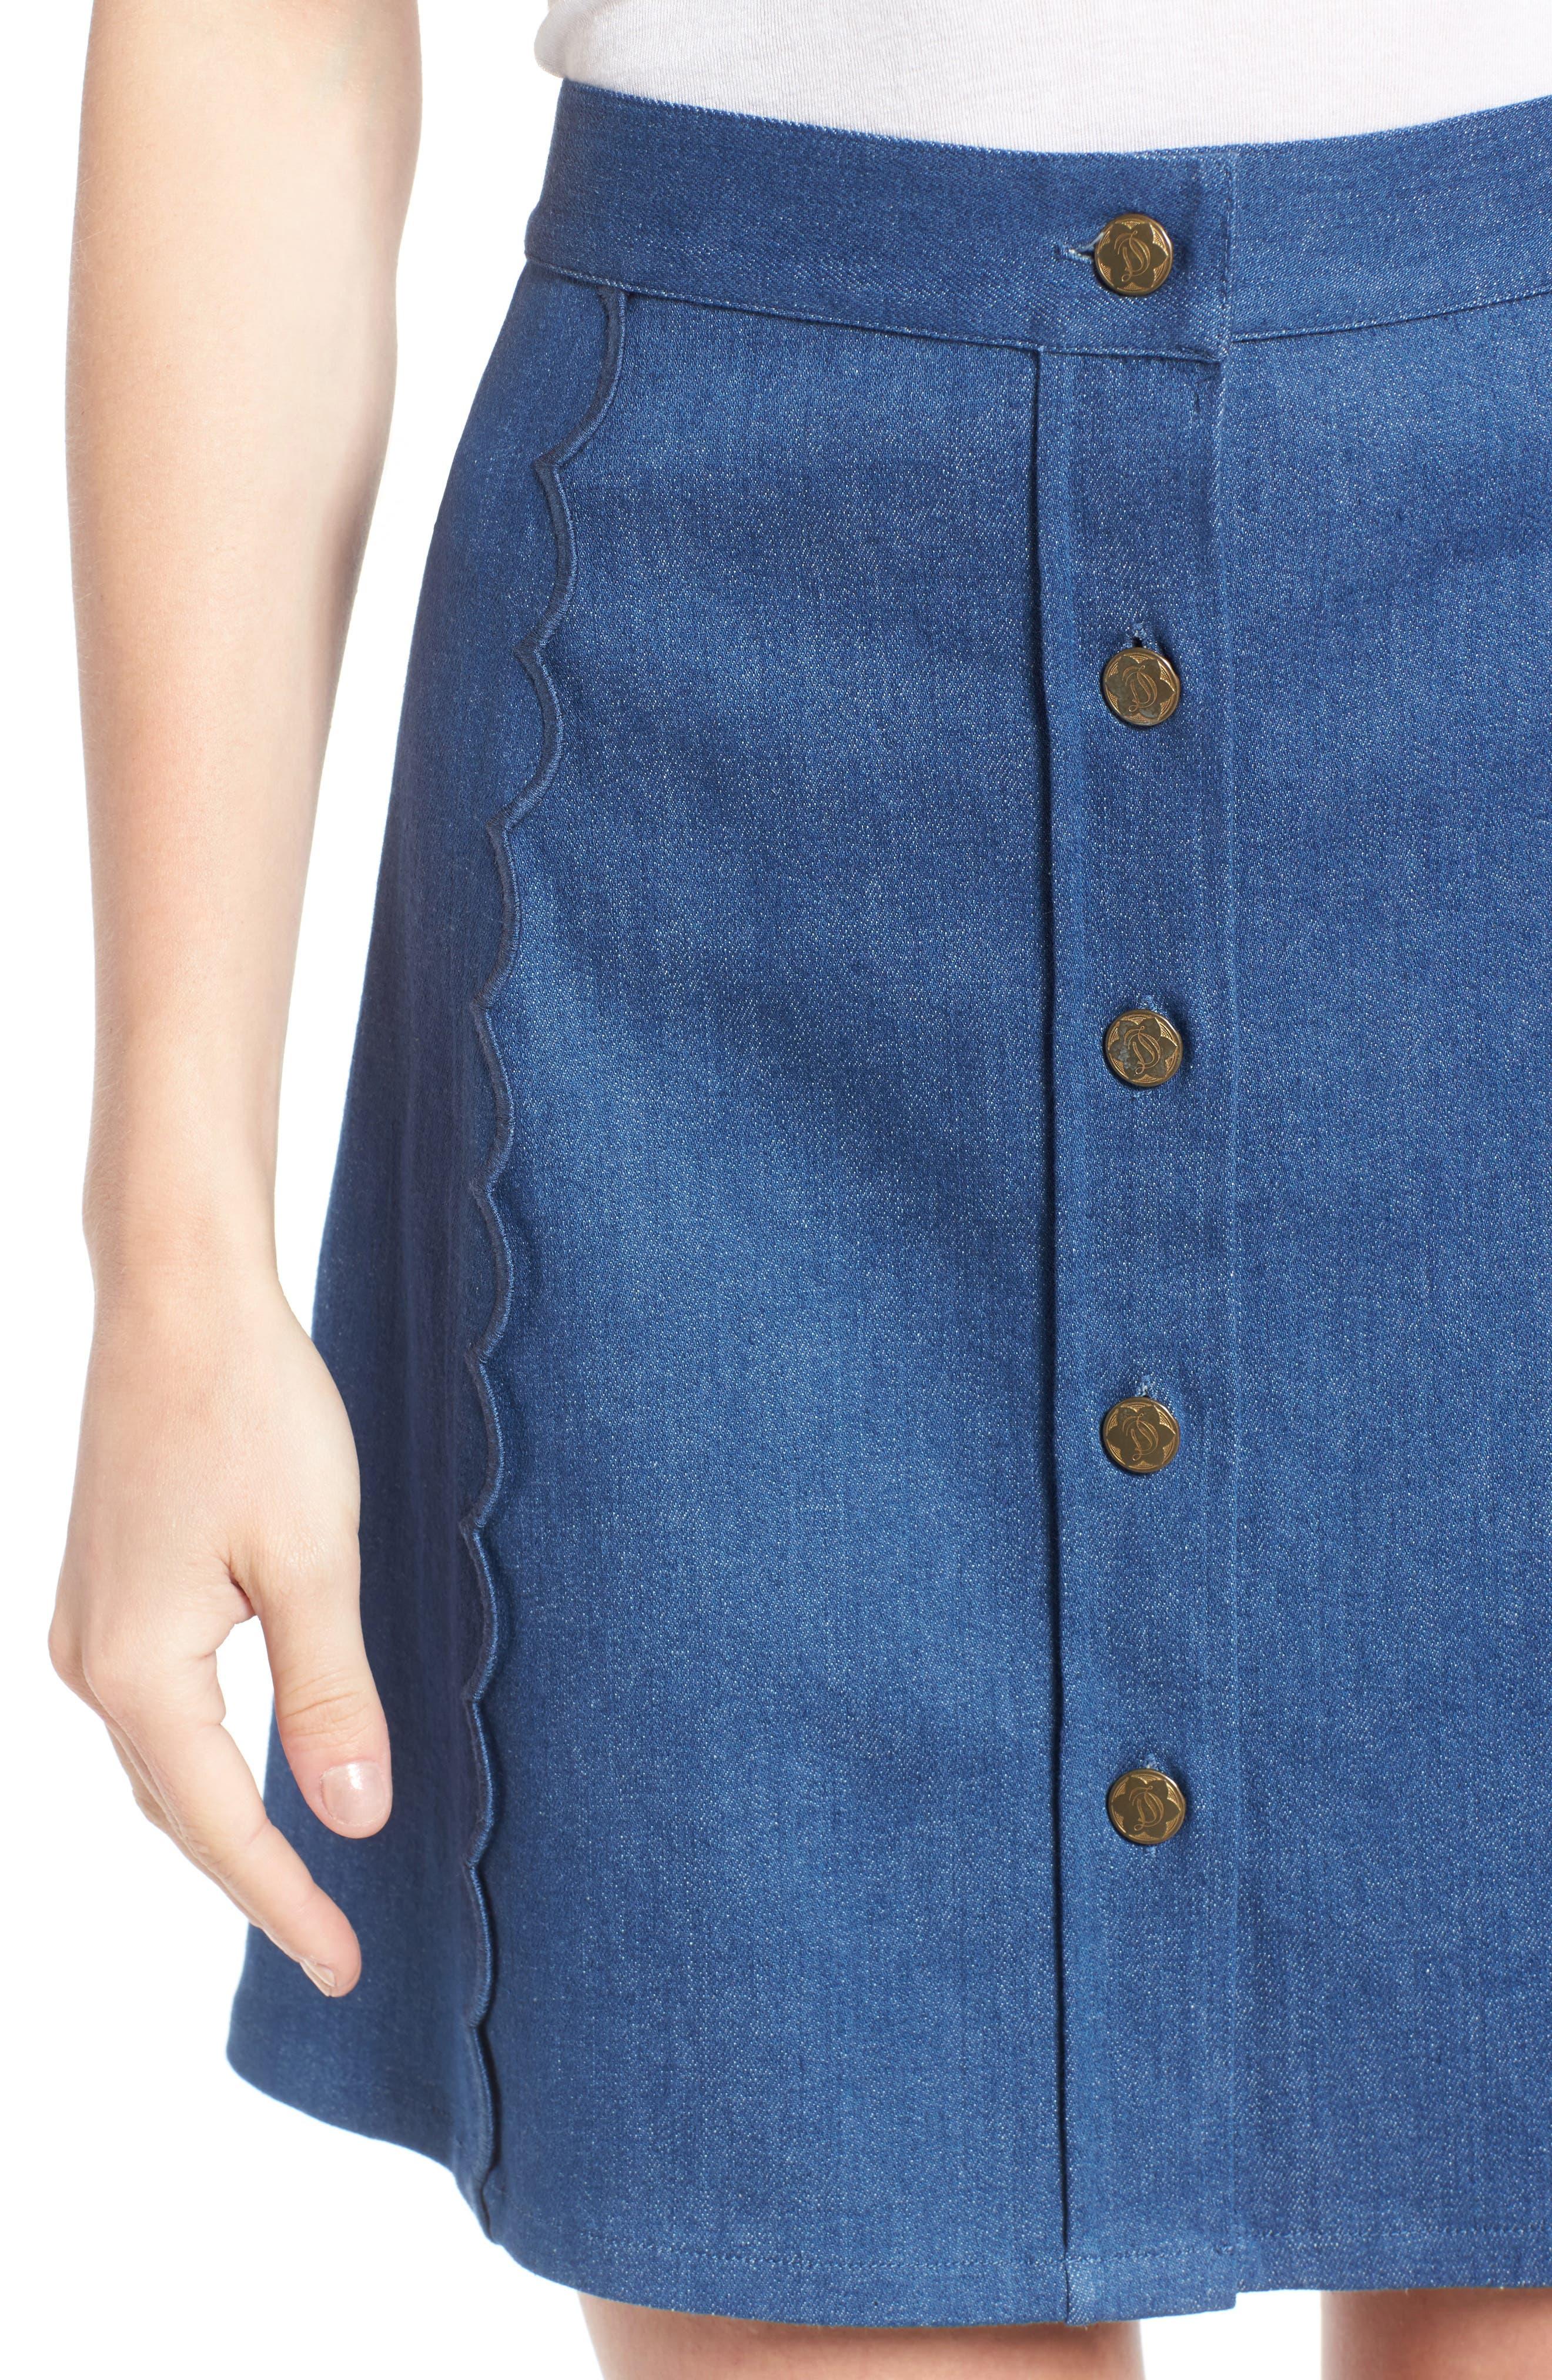 Alternate Image 4  - Draper James Stretch Denim Miniskirt (Nordstrom Exclusive)